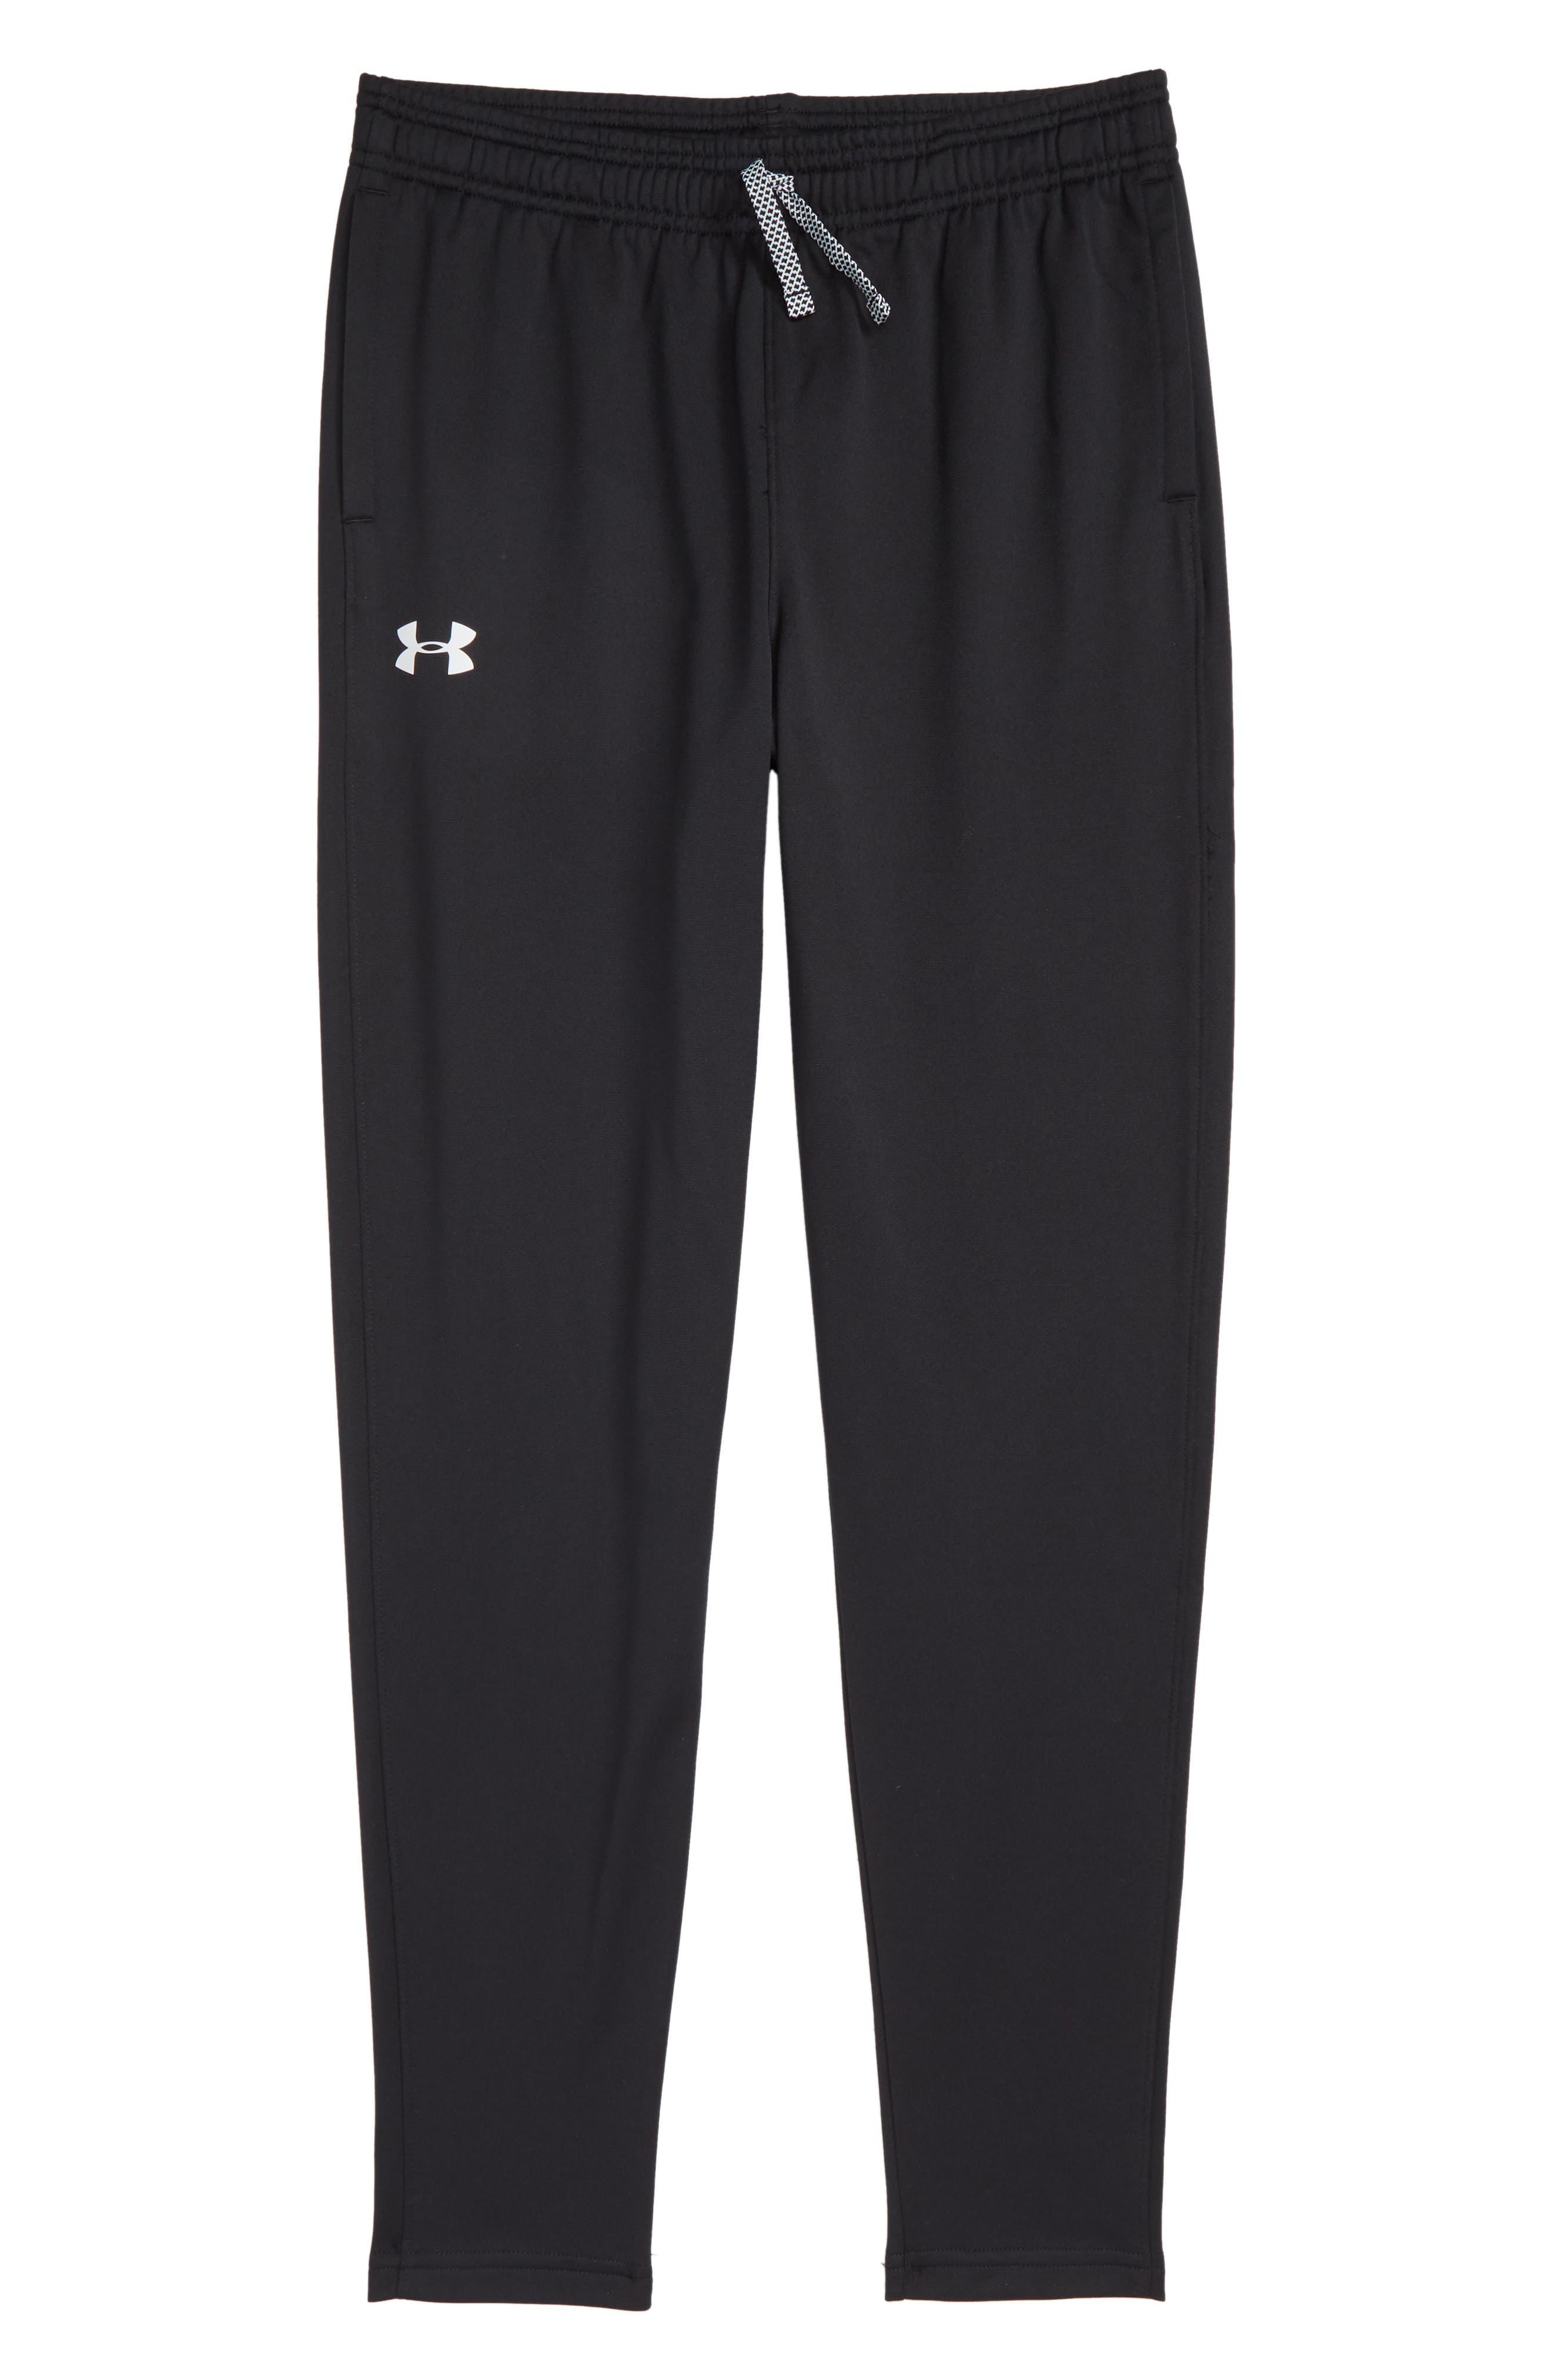 Brawler Tapered Sweatpants,                             Main thumbnail 1, color,                             BLACK/ WHITE